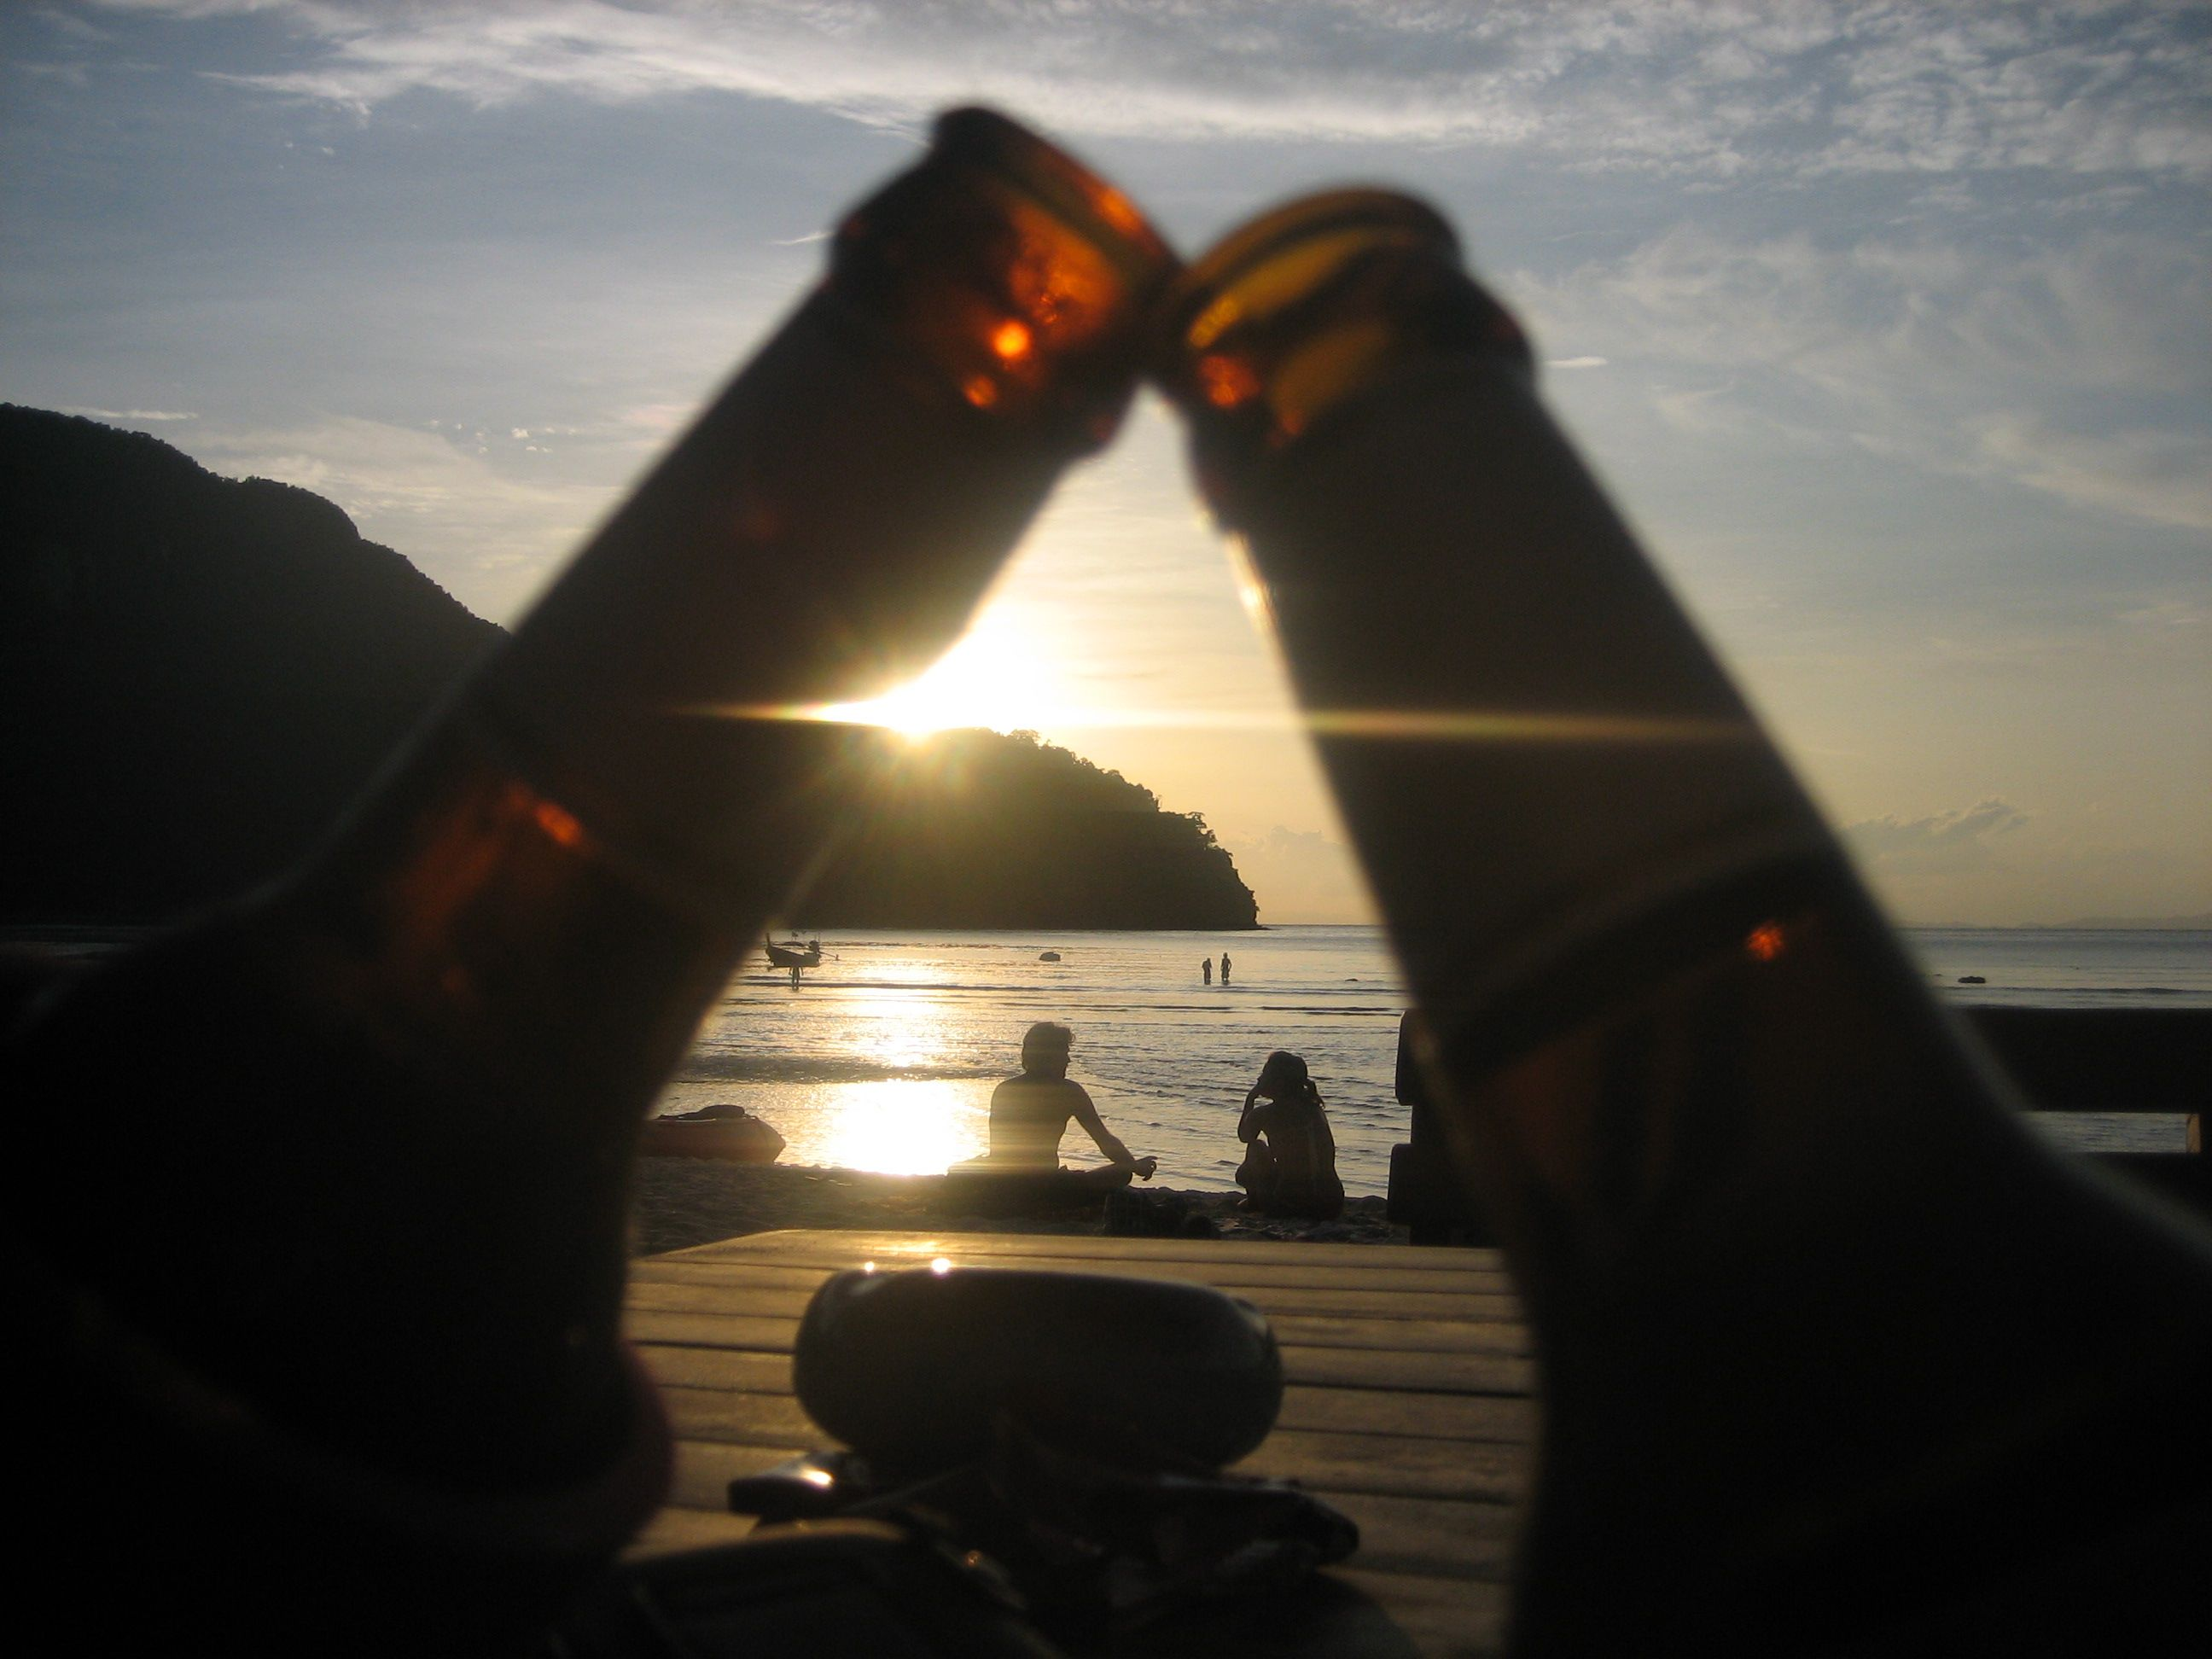 Sunset at Koh Phi phi, Thailand